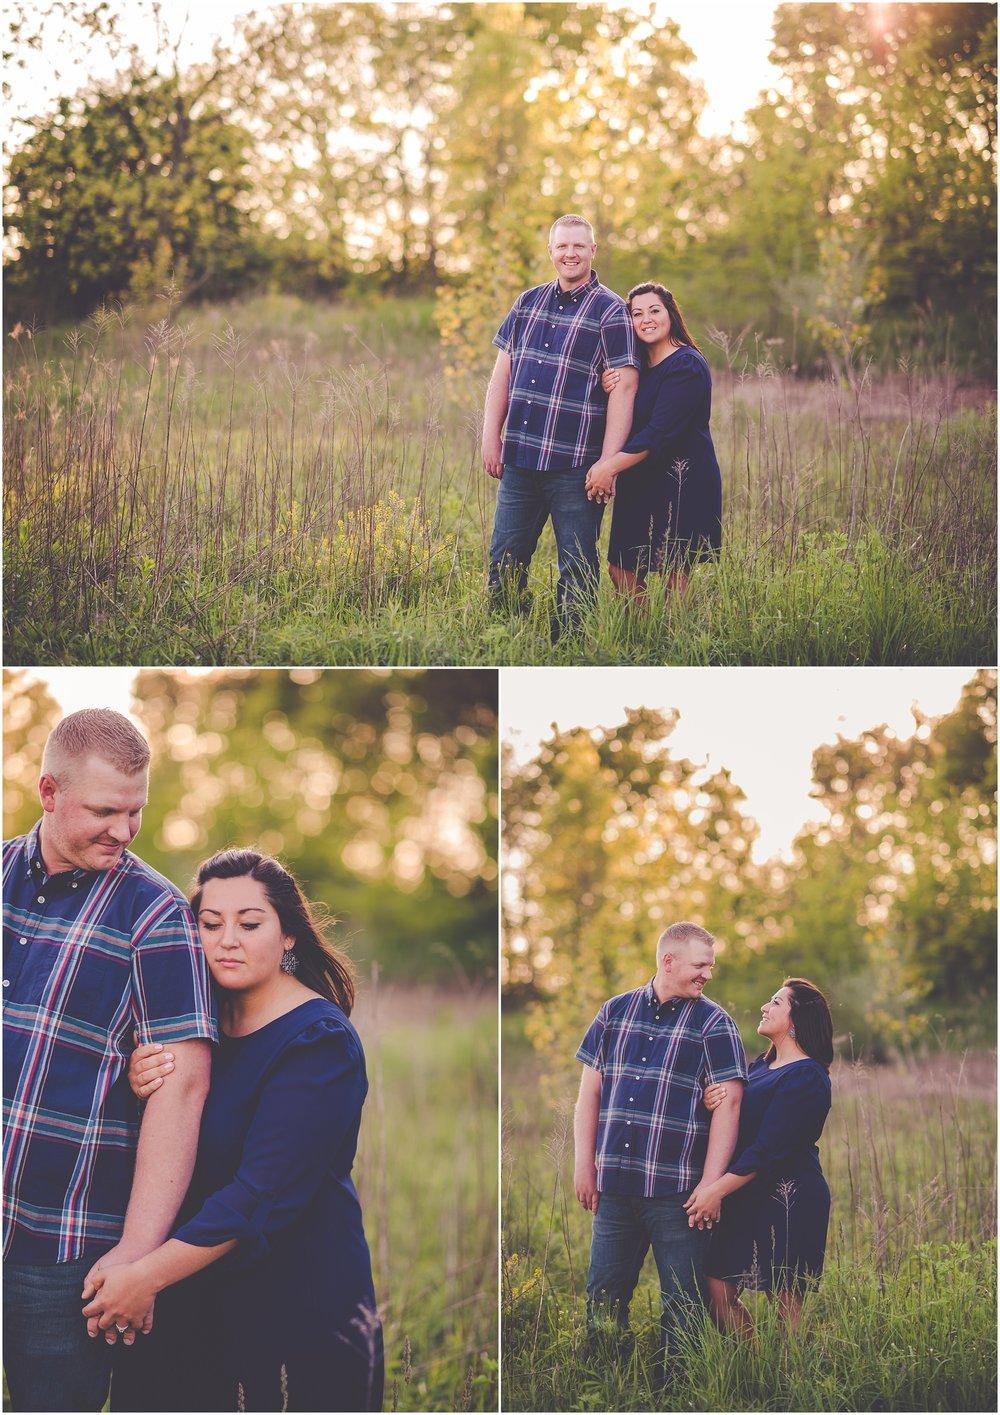 Kara Evans Photographer - Central Illinois Wedding Photographer - Kankakee Wedding Photographer - Spring Engagement Session - Kankakee County Wedding Photographer